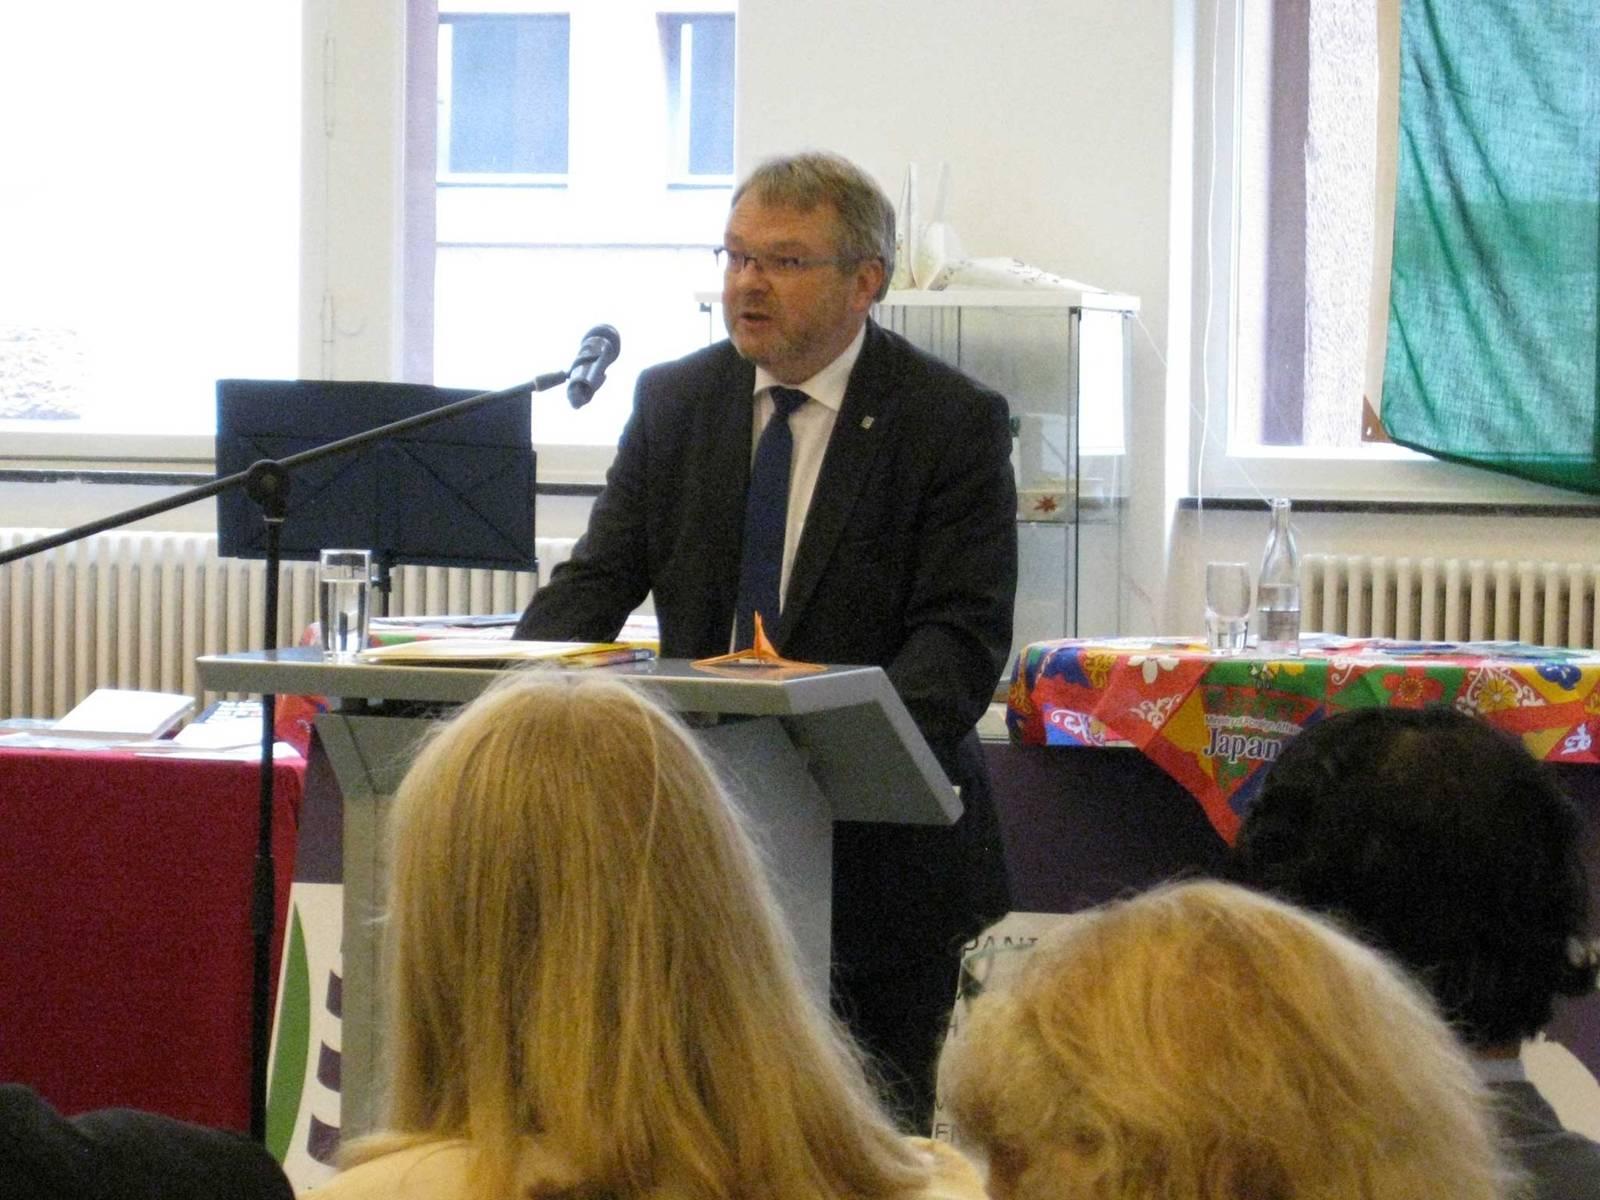 Bürgermeister Thomas Hermann am Redner-Pult